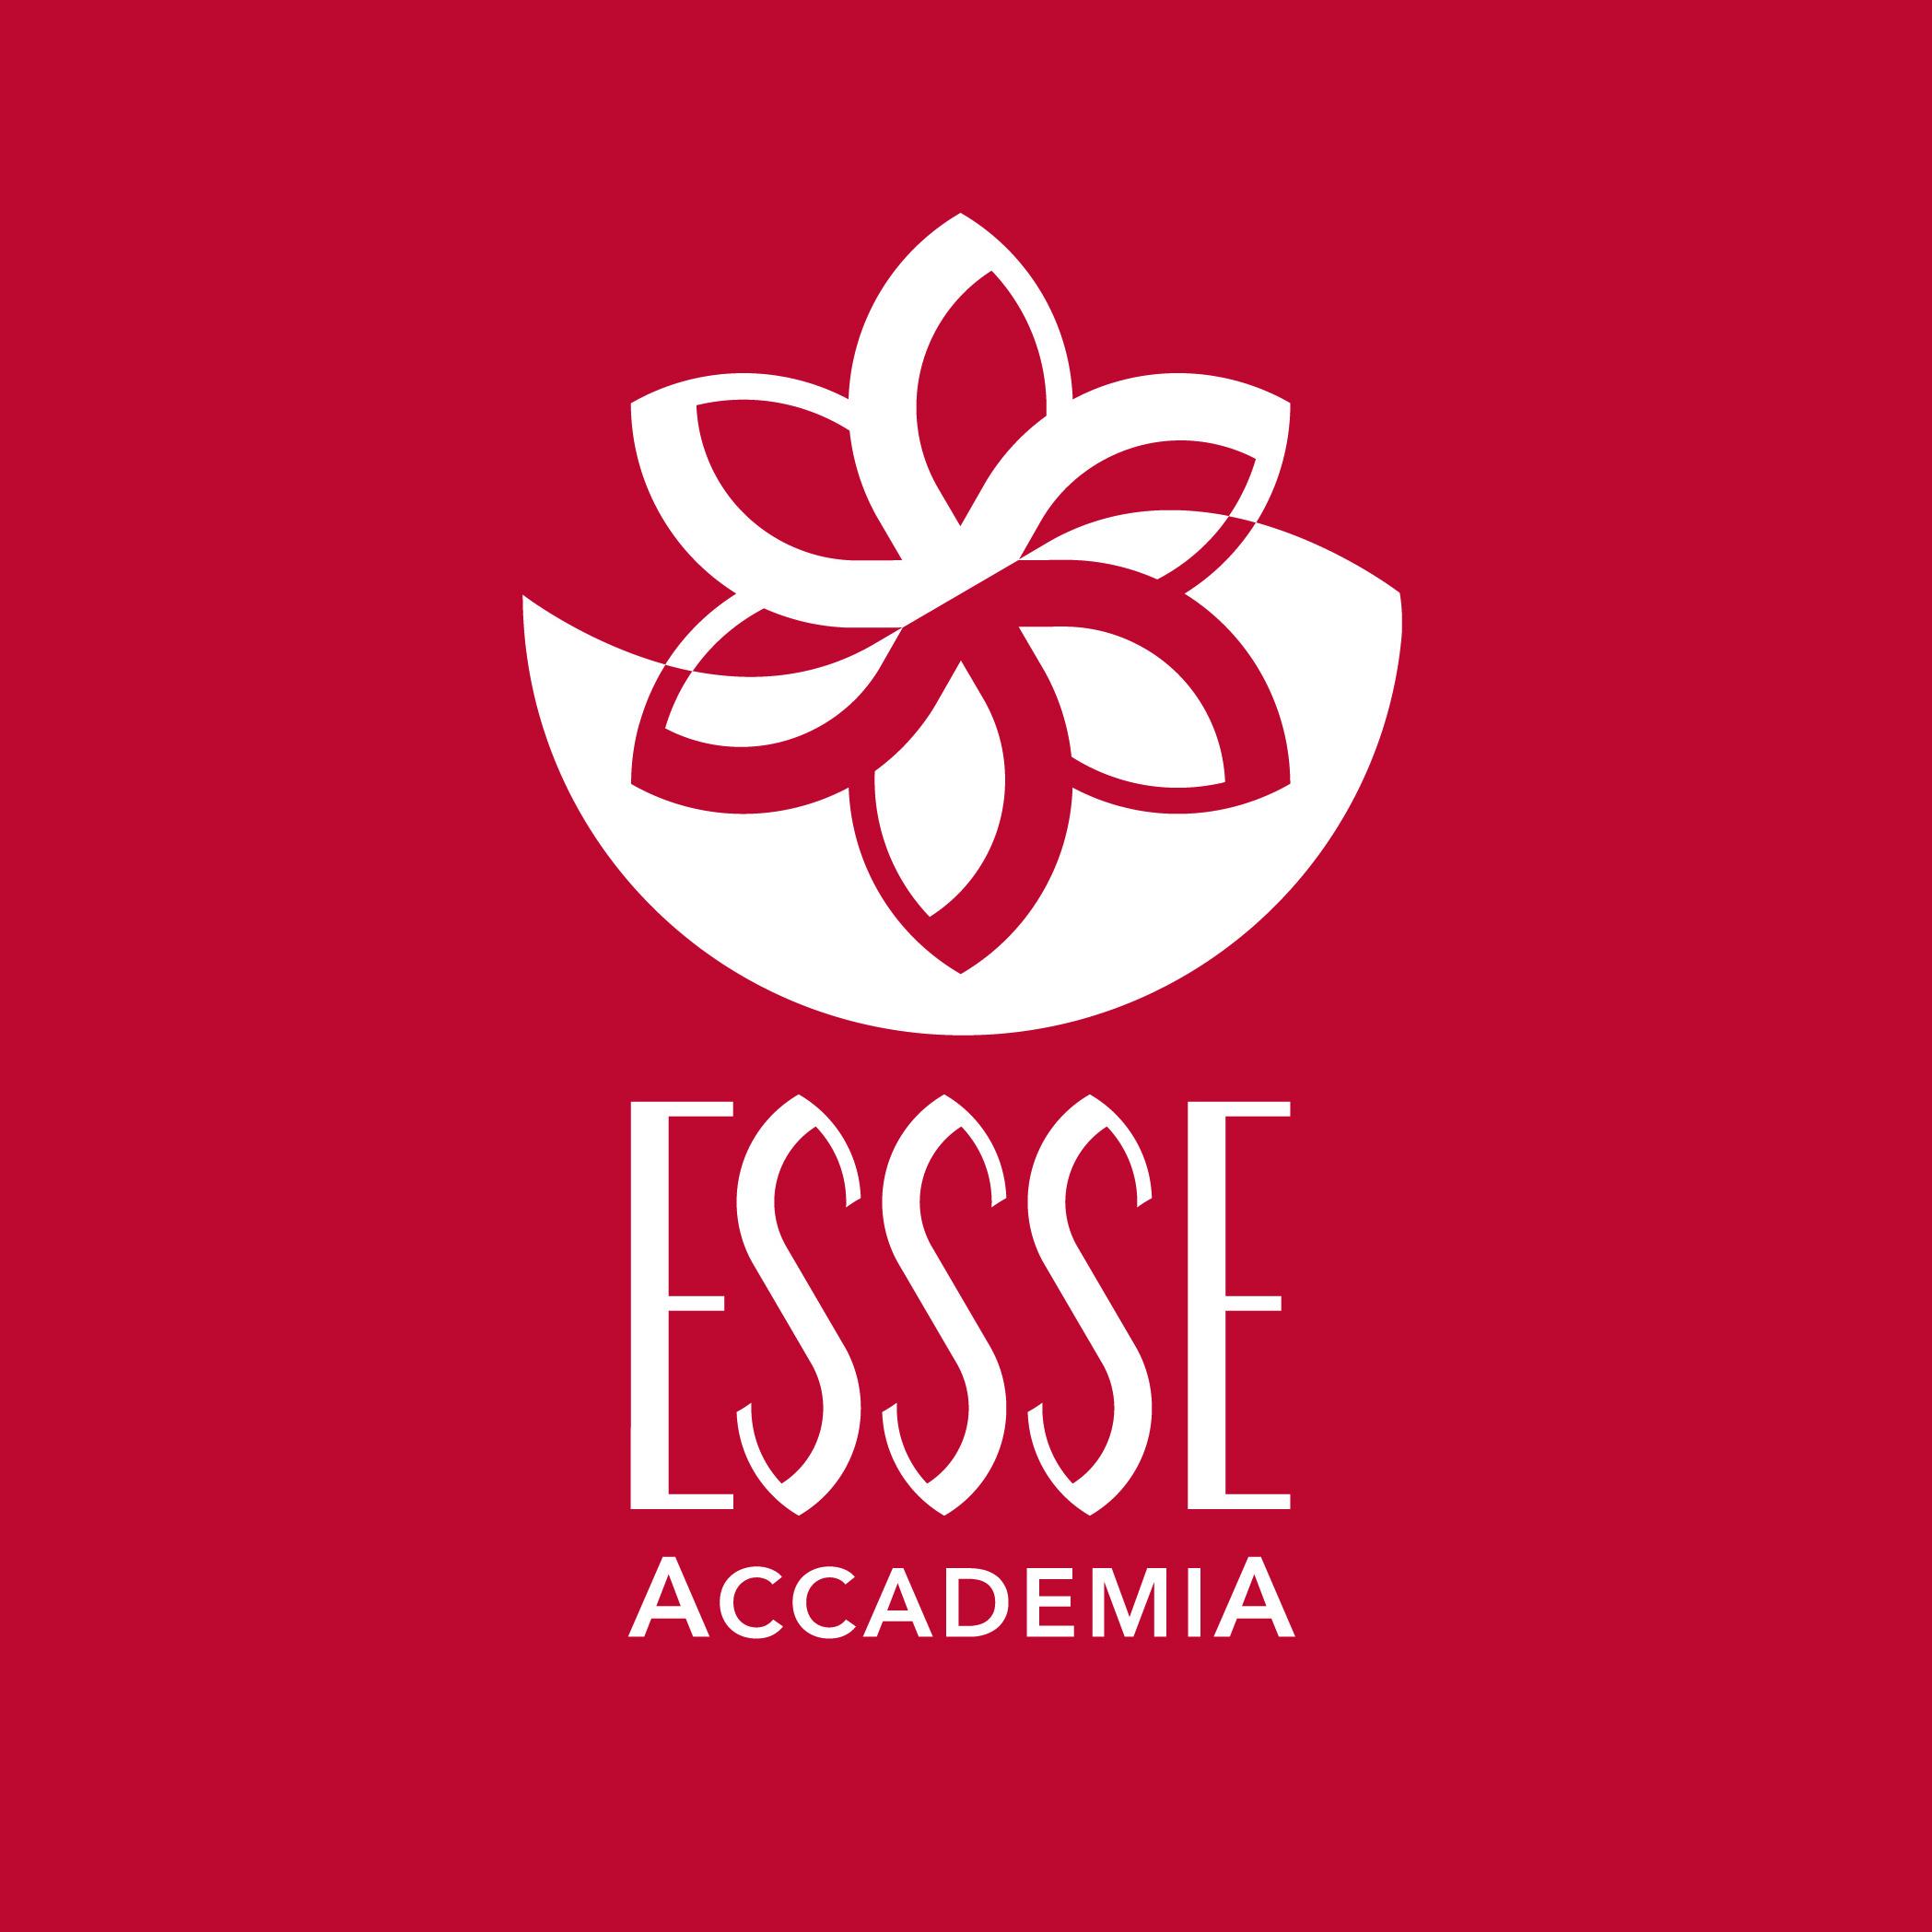 Logo ESSSE Accademia